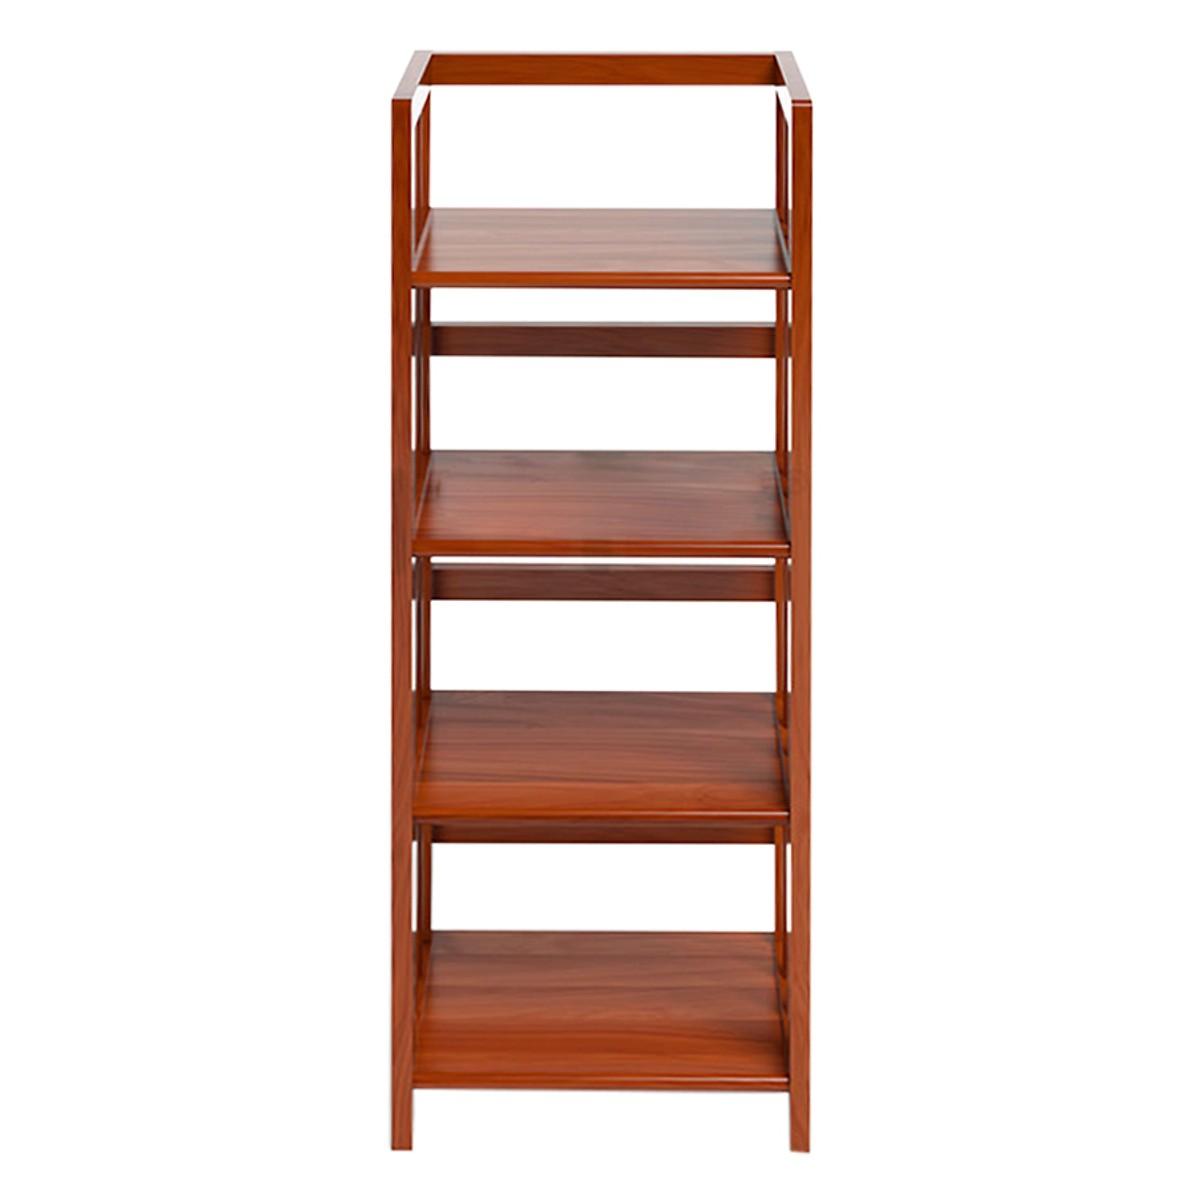 Kệ sách 4 tầng gỗ cao su Ibie KS440 40cm